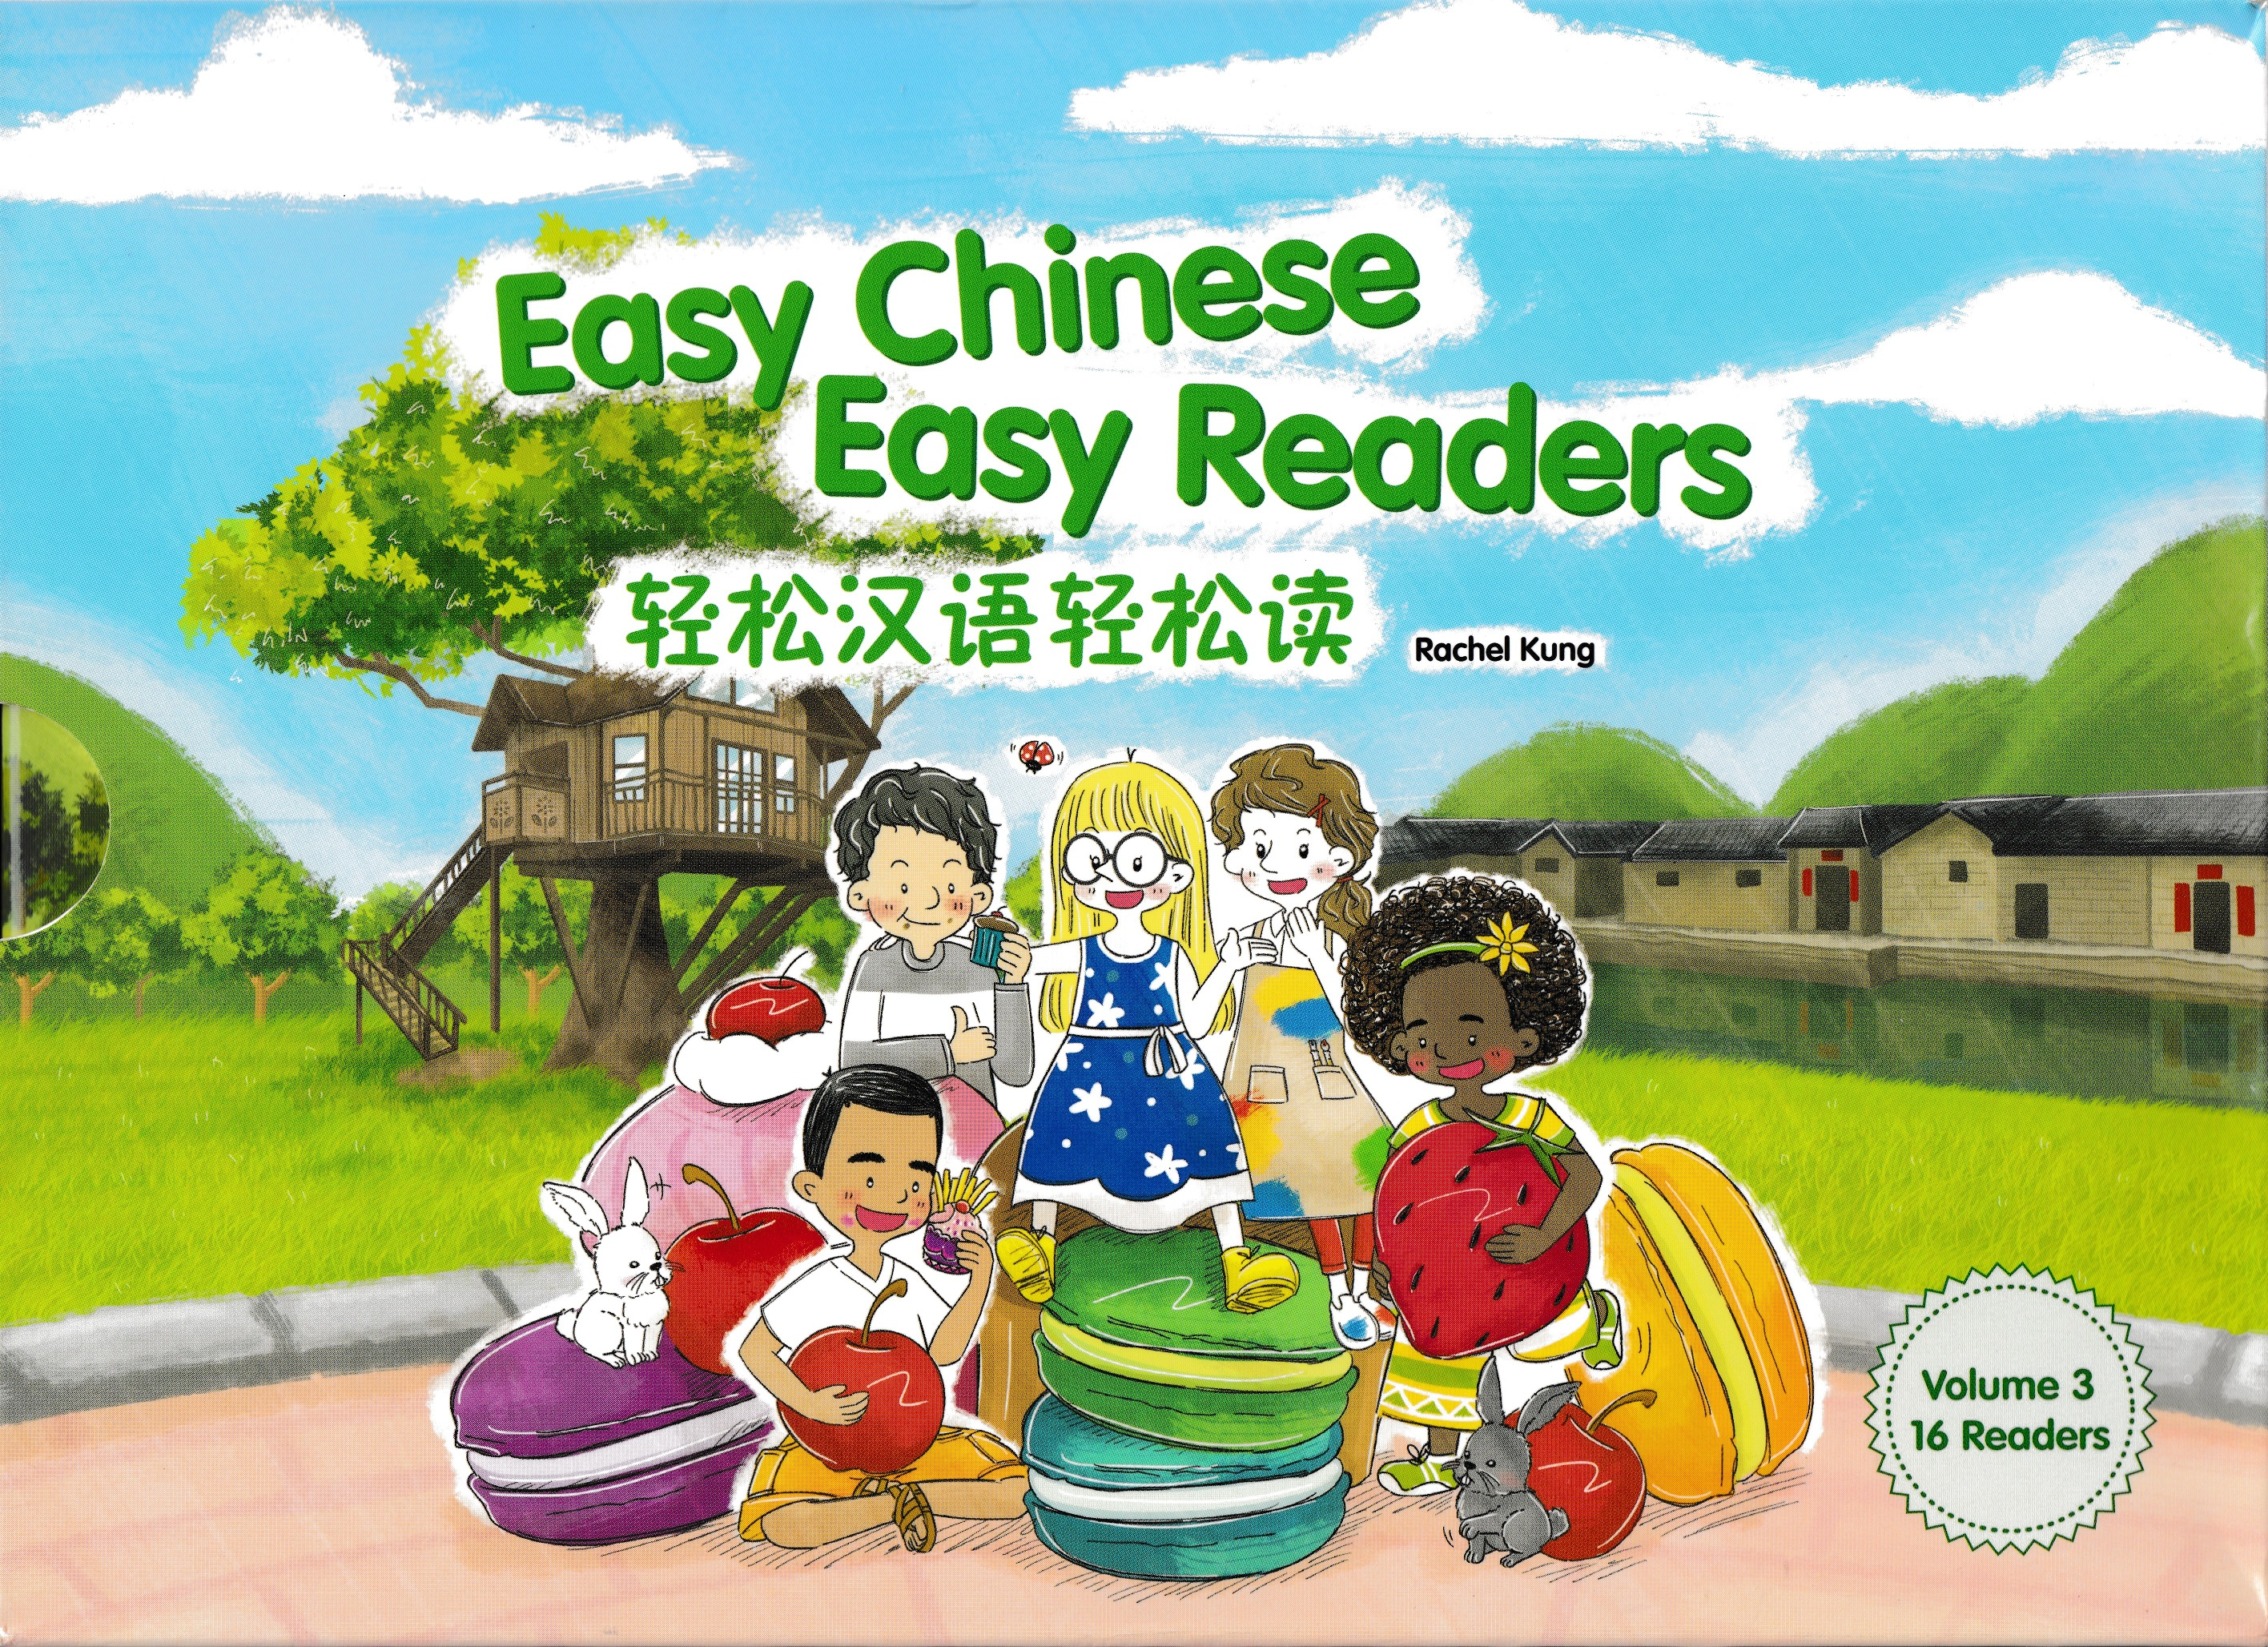 Easy Chinese Easy Readers Volume 3